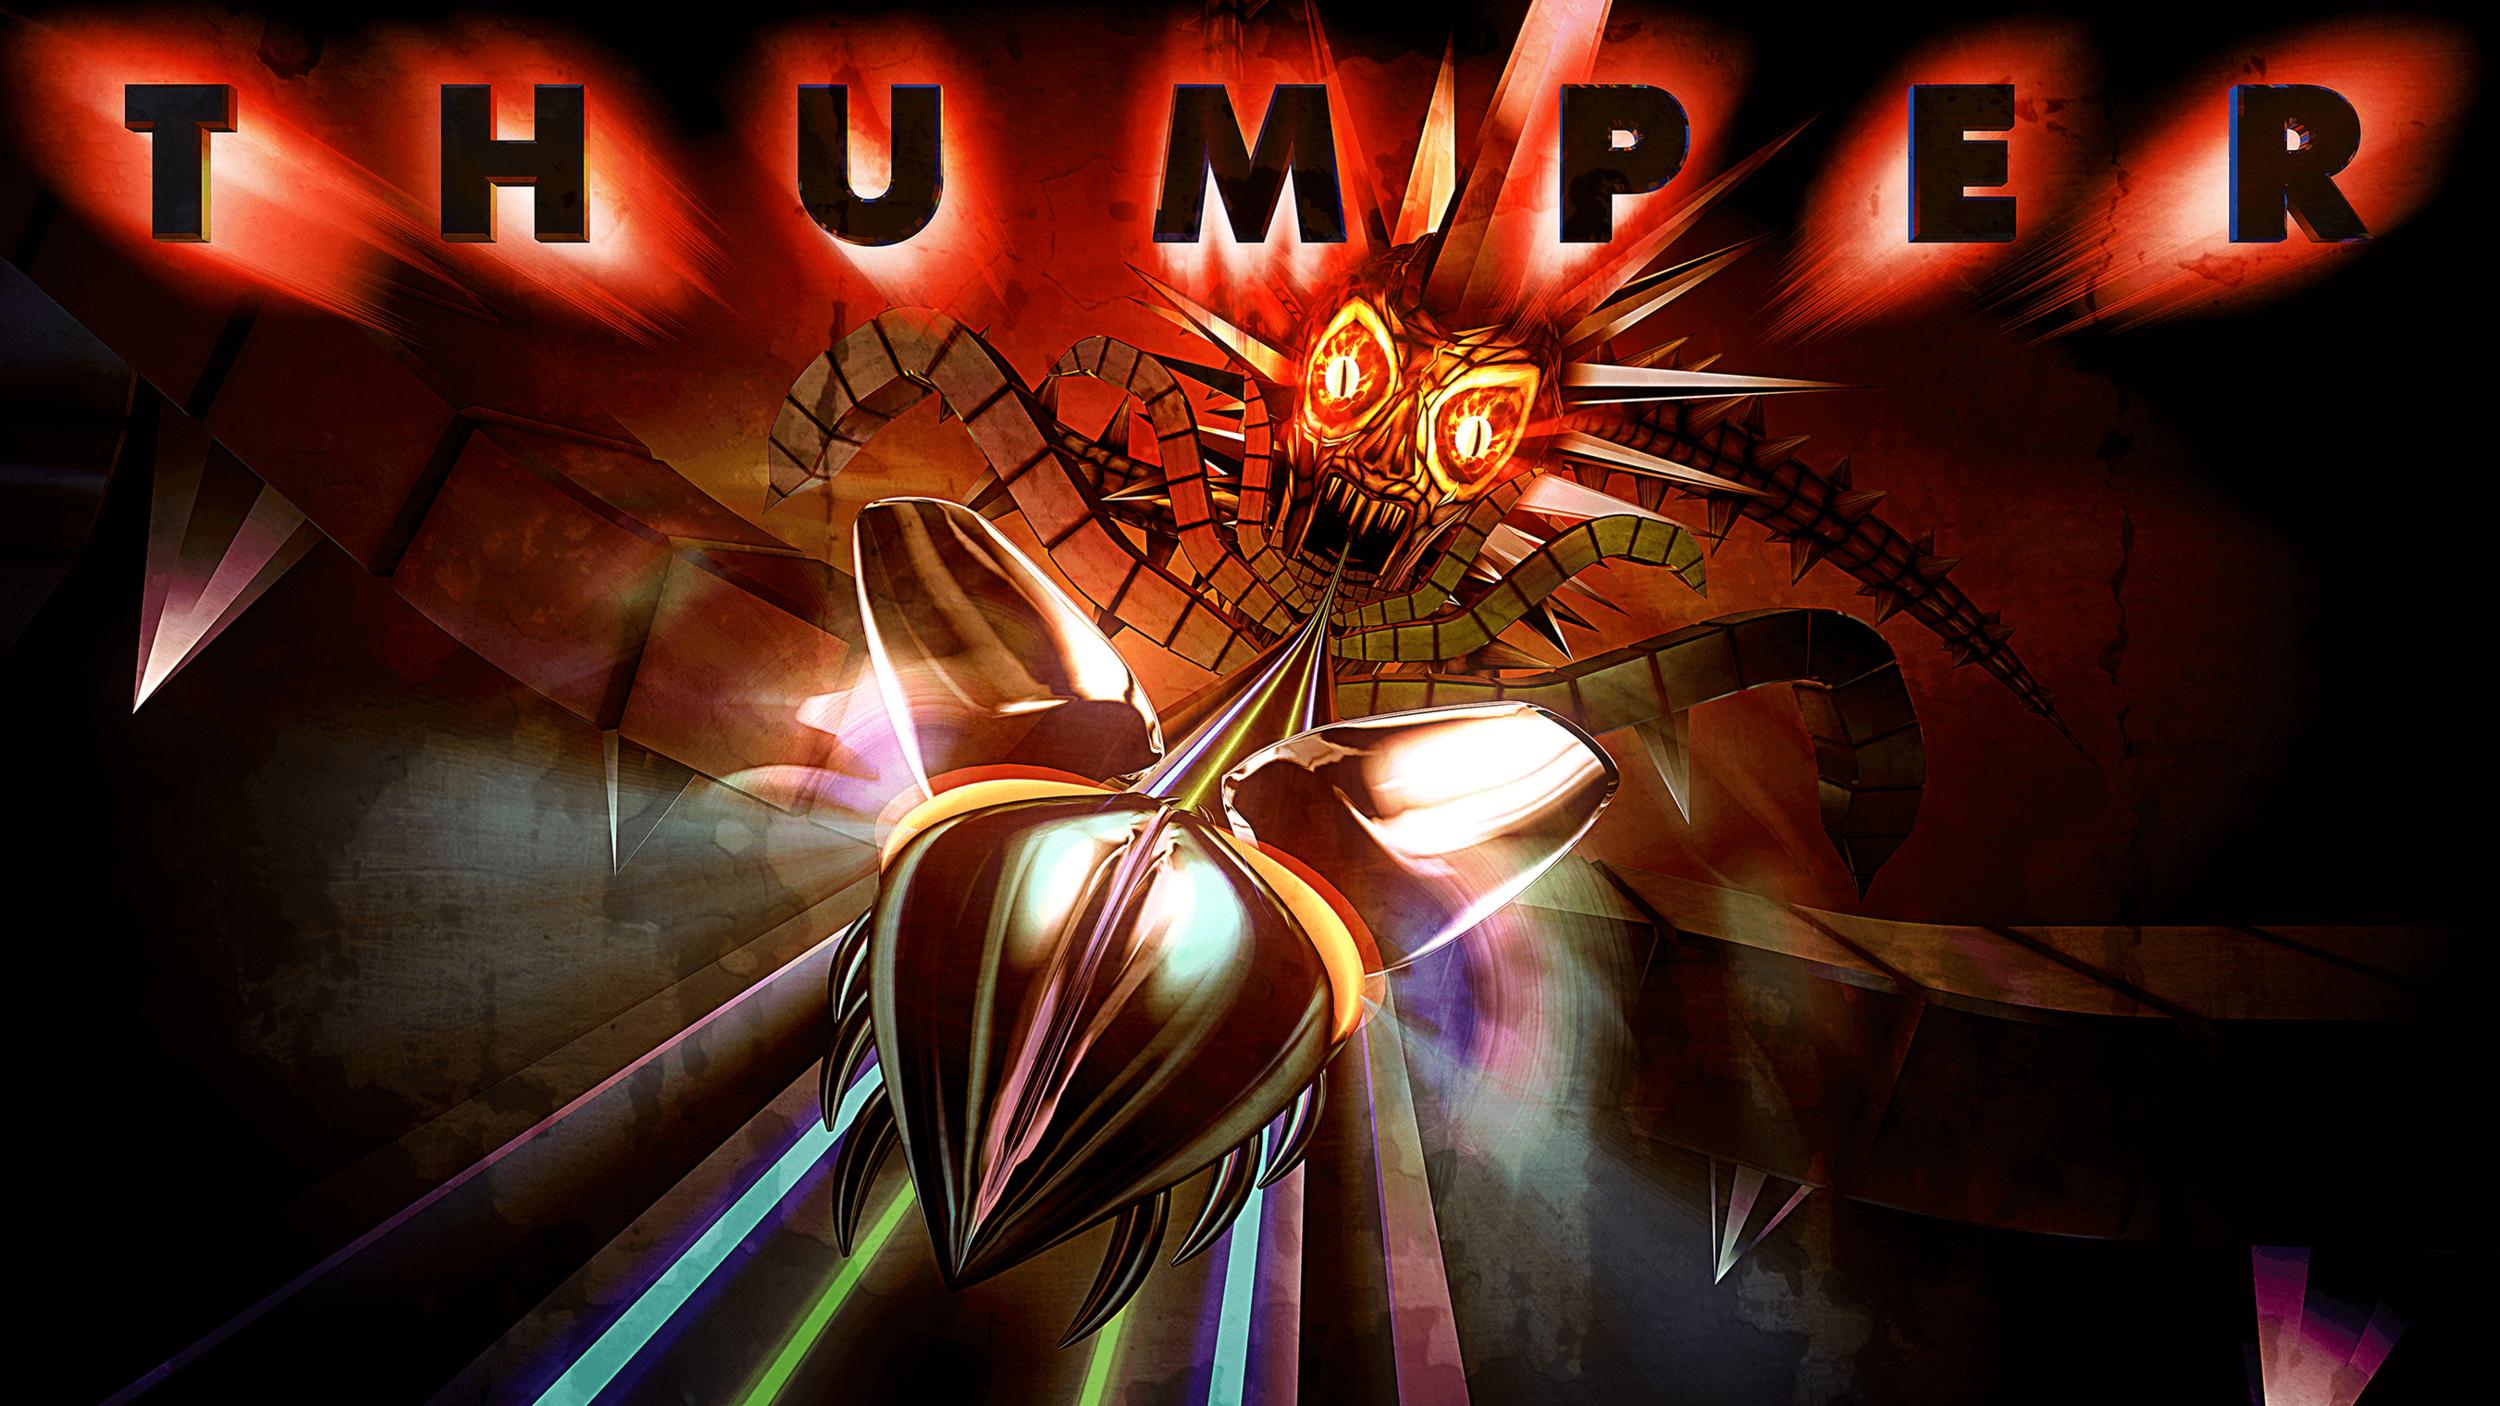 Thumper_banner_16_9_hirez.png